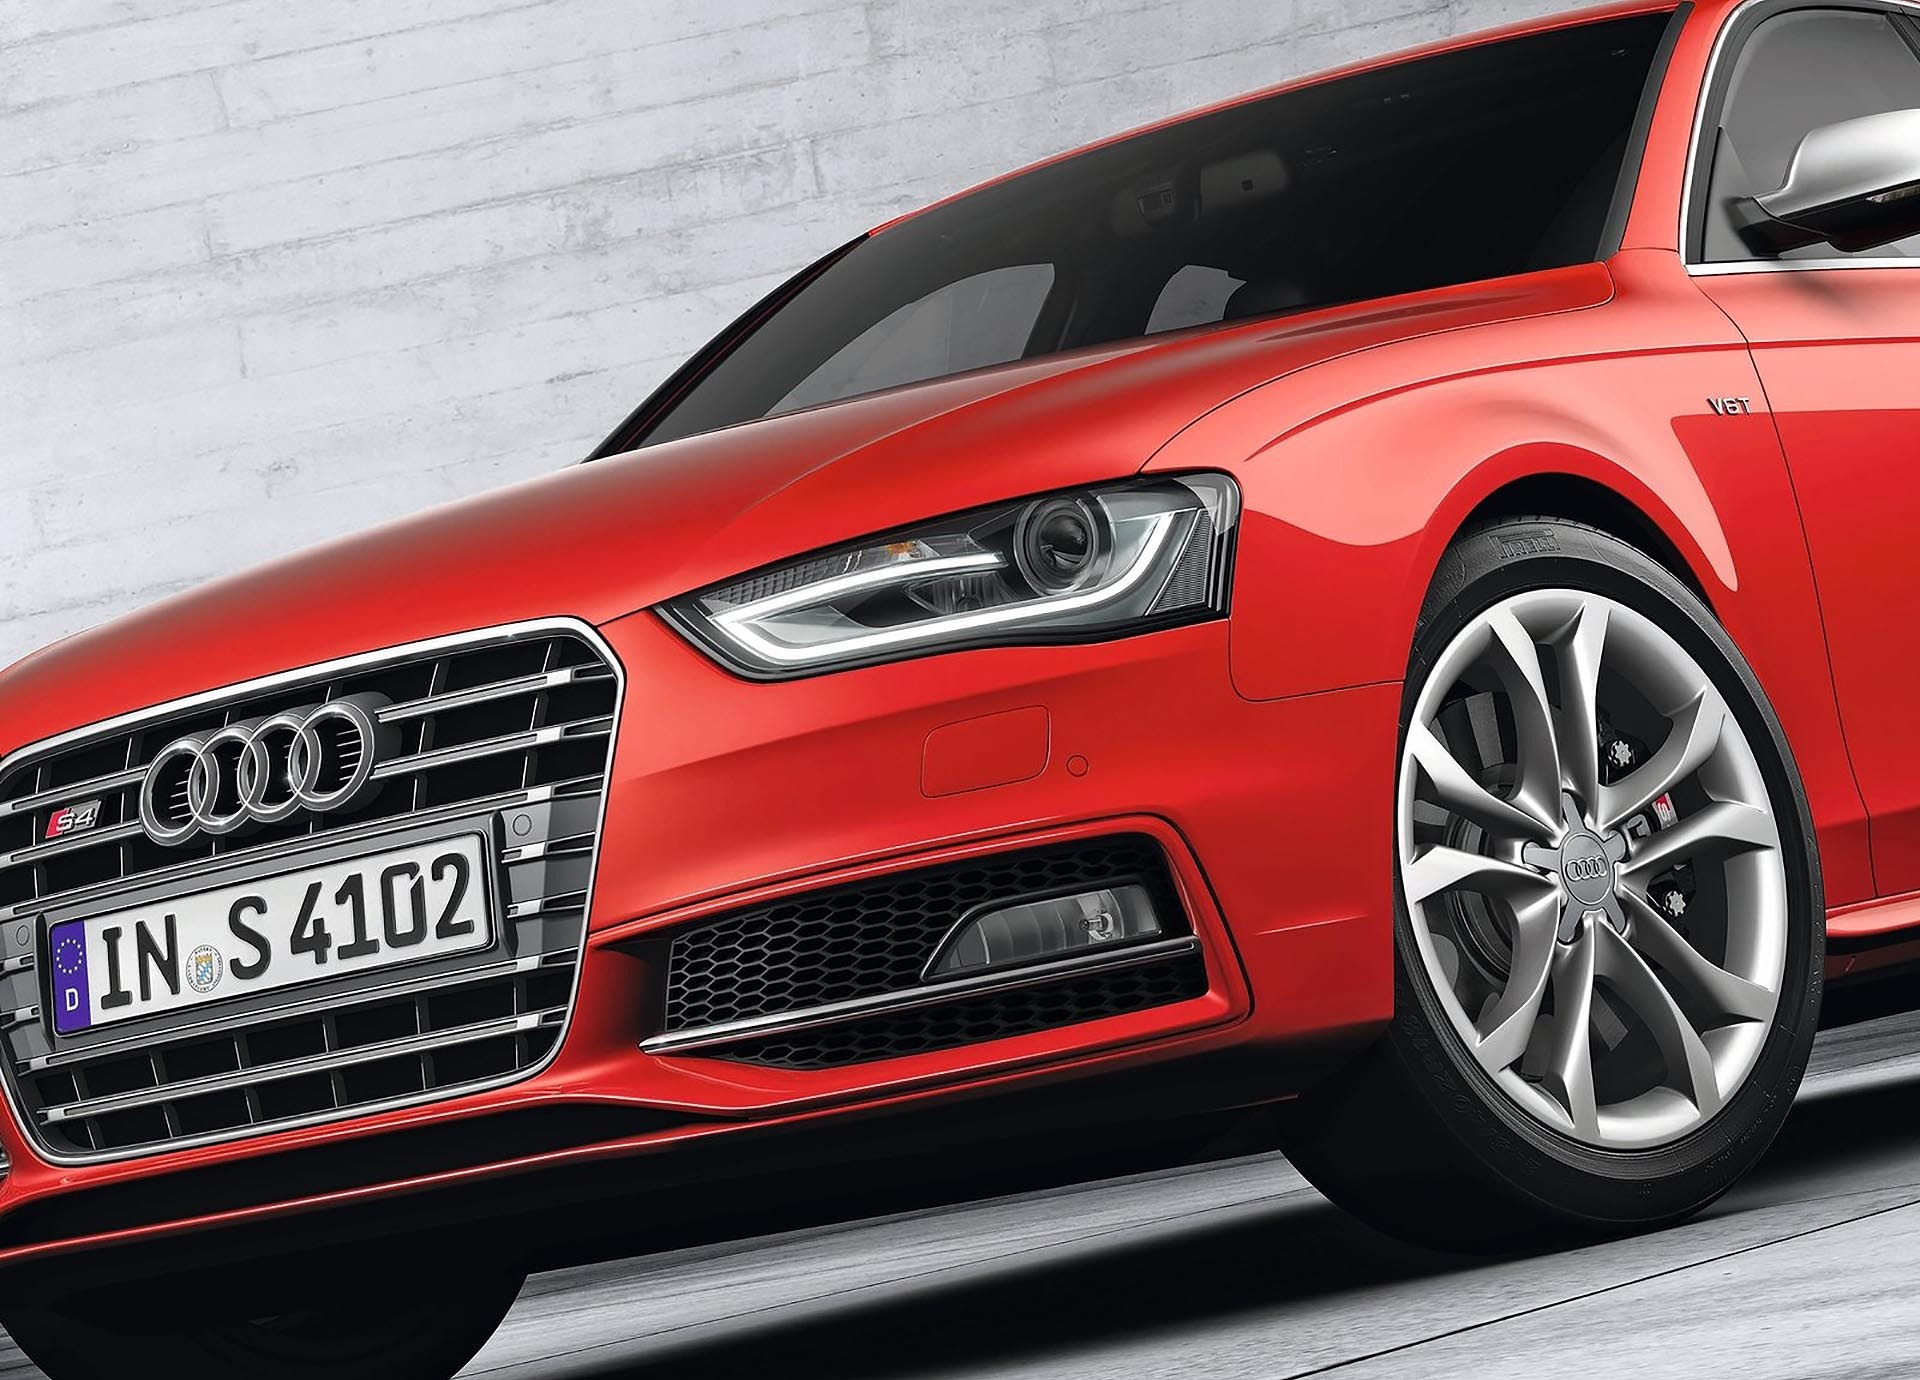 09_B8.5 Audi S4 front detail